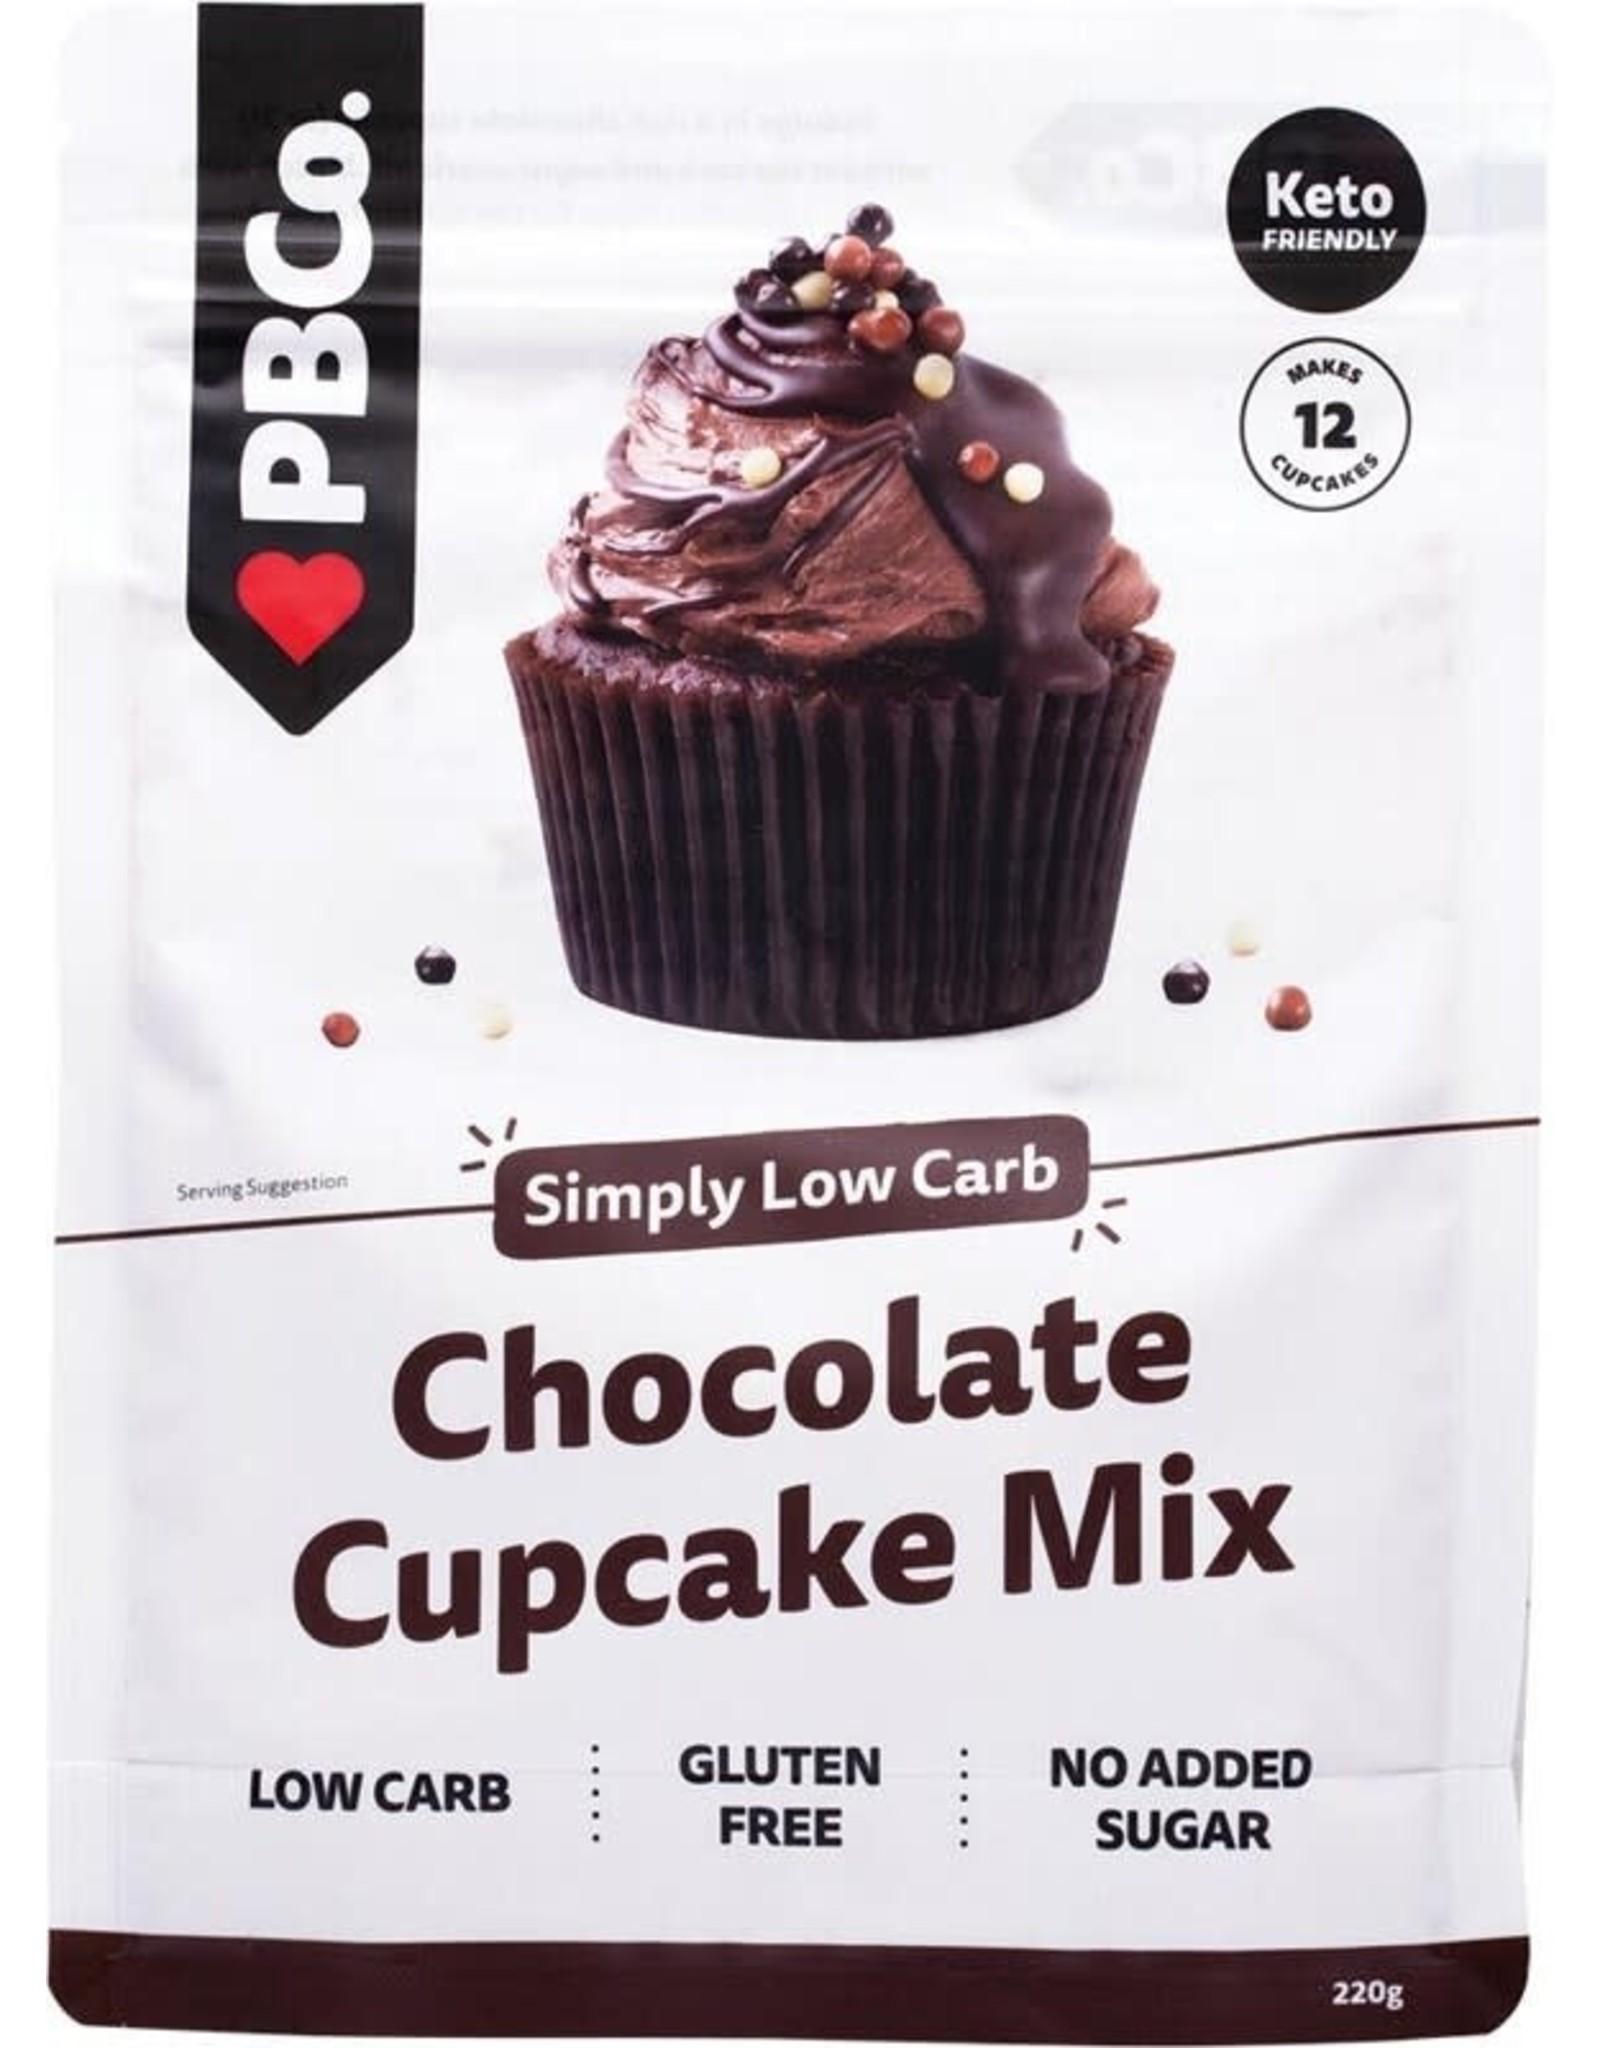 PBCO Low Carb Chocolate Cupcake Mix 220g